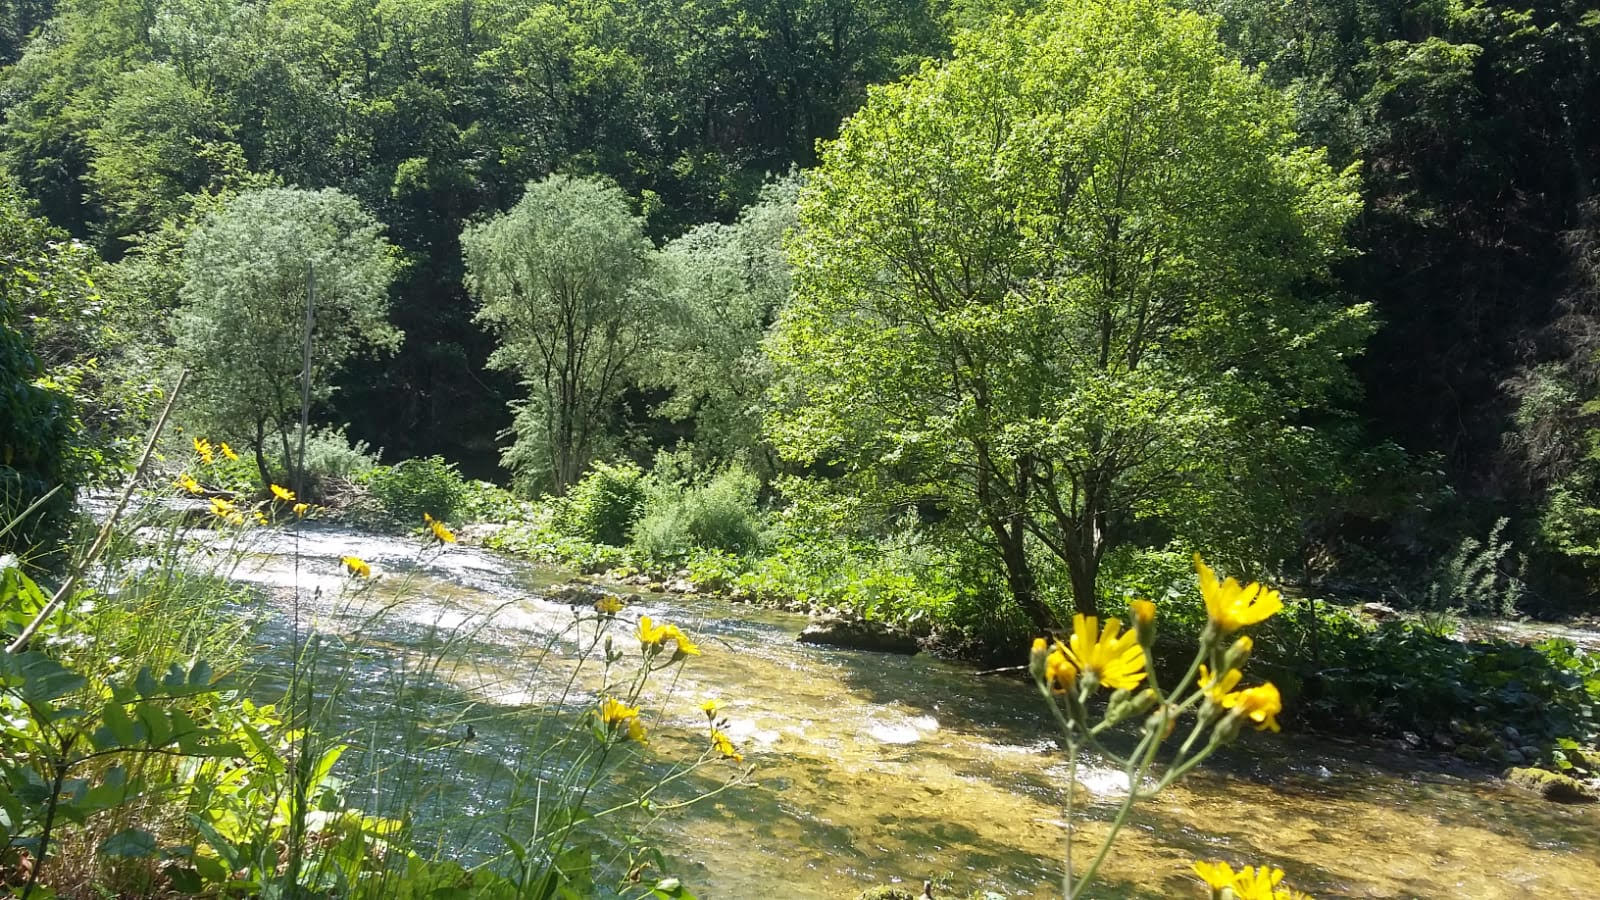 Les Pertes de la Valserine : un véritable trésor naturel